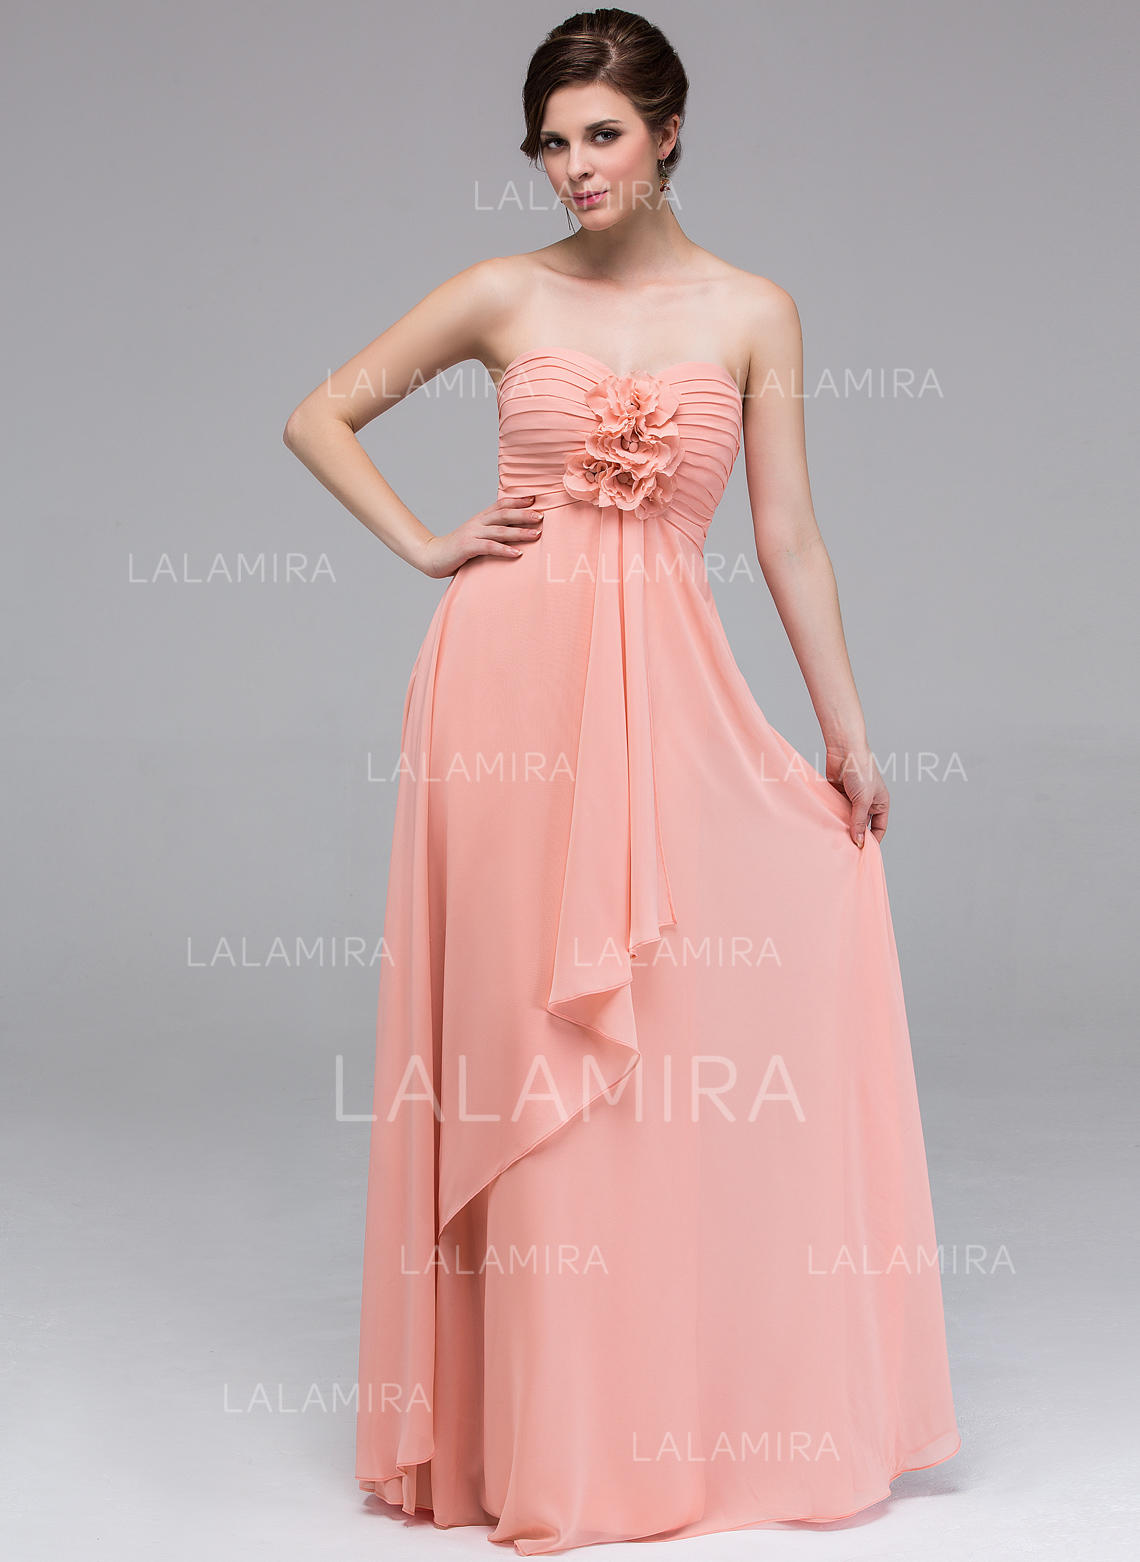 2876ad69fdfe A-Line/Princess Chiffon Bridesmaid Dresses Flower(s) Cascading Ruffles  Sweetheart Sleeveless. Loading zoom